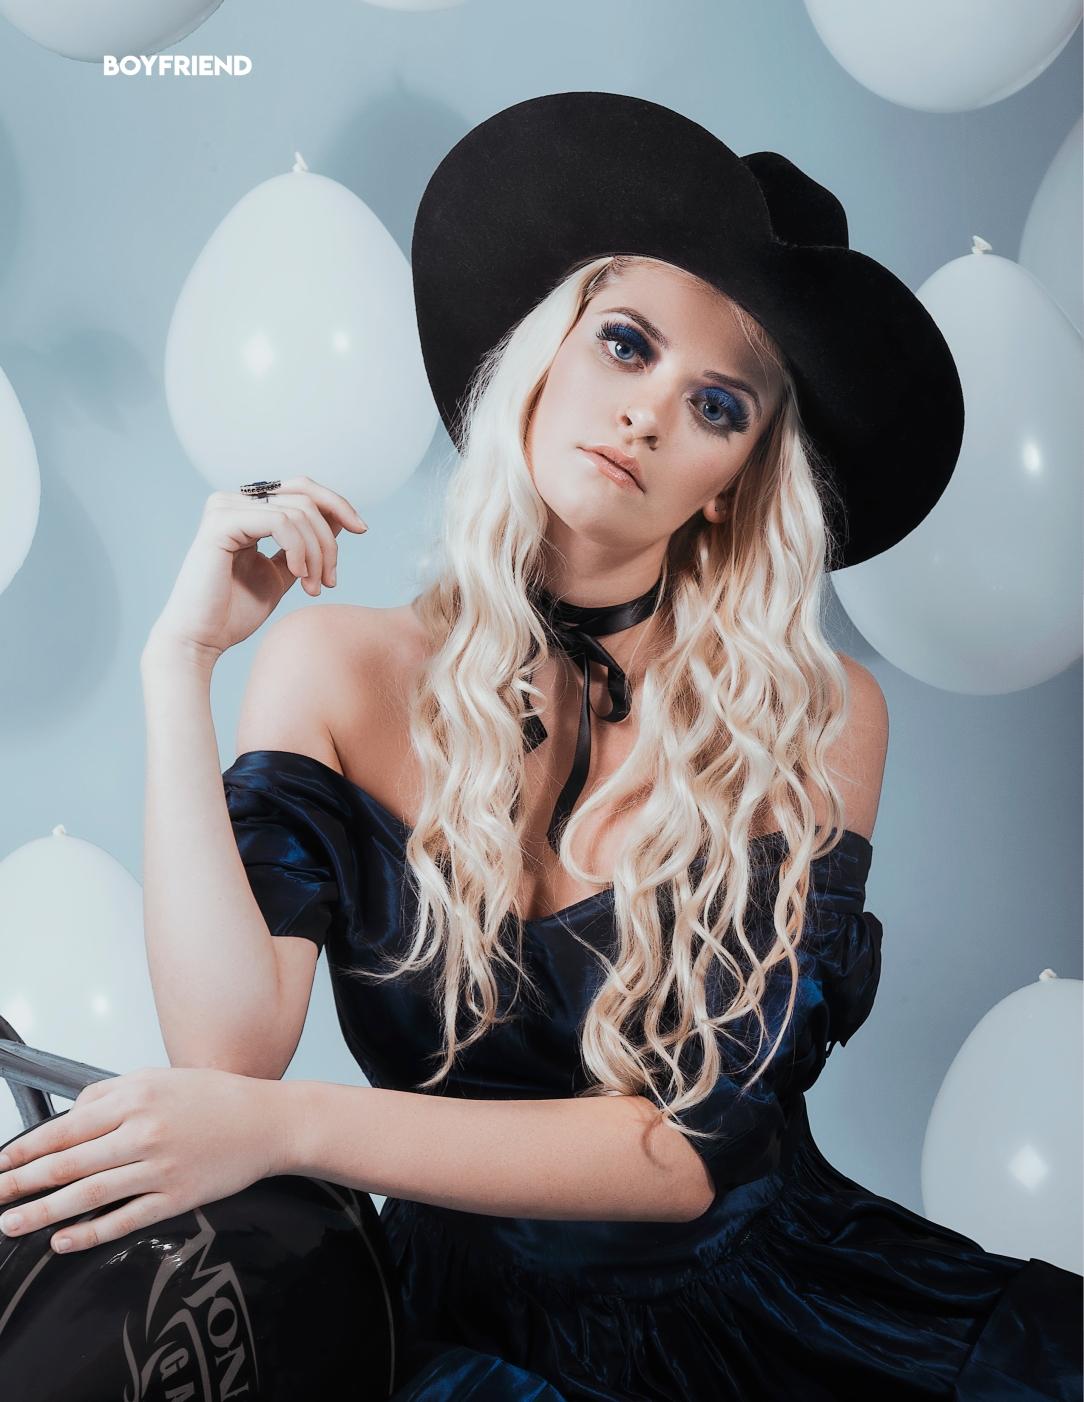 Boyfriend Mag - October 2018 - MississippiFlood - Natasha Hayes4